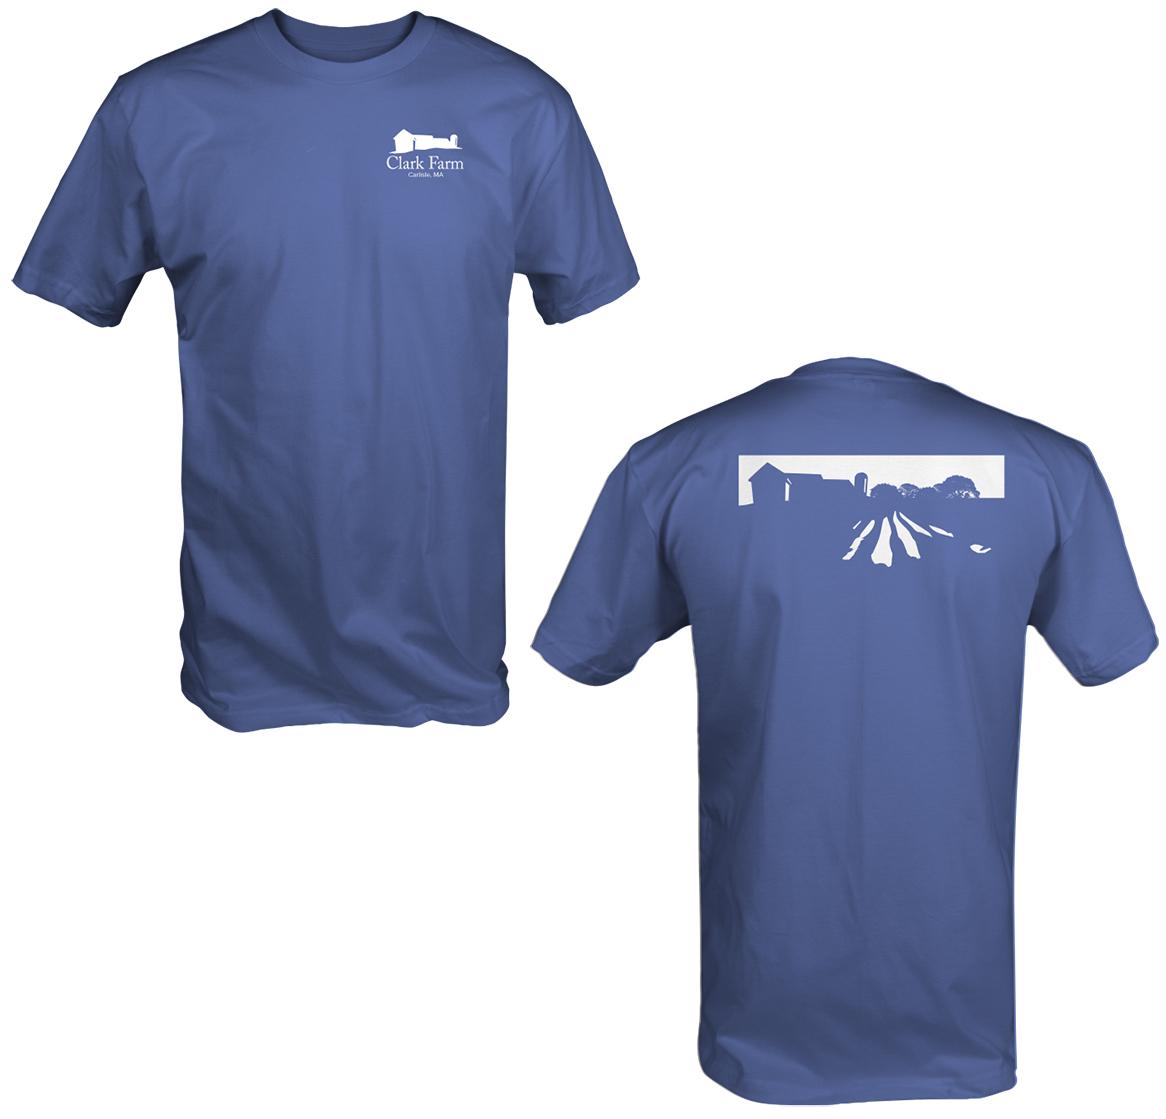 Clark Farm Field Shirt Blue